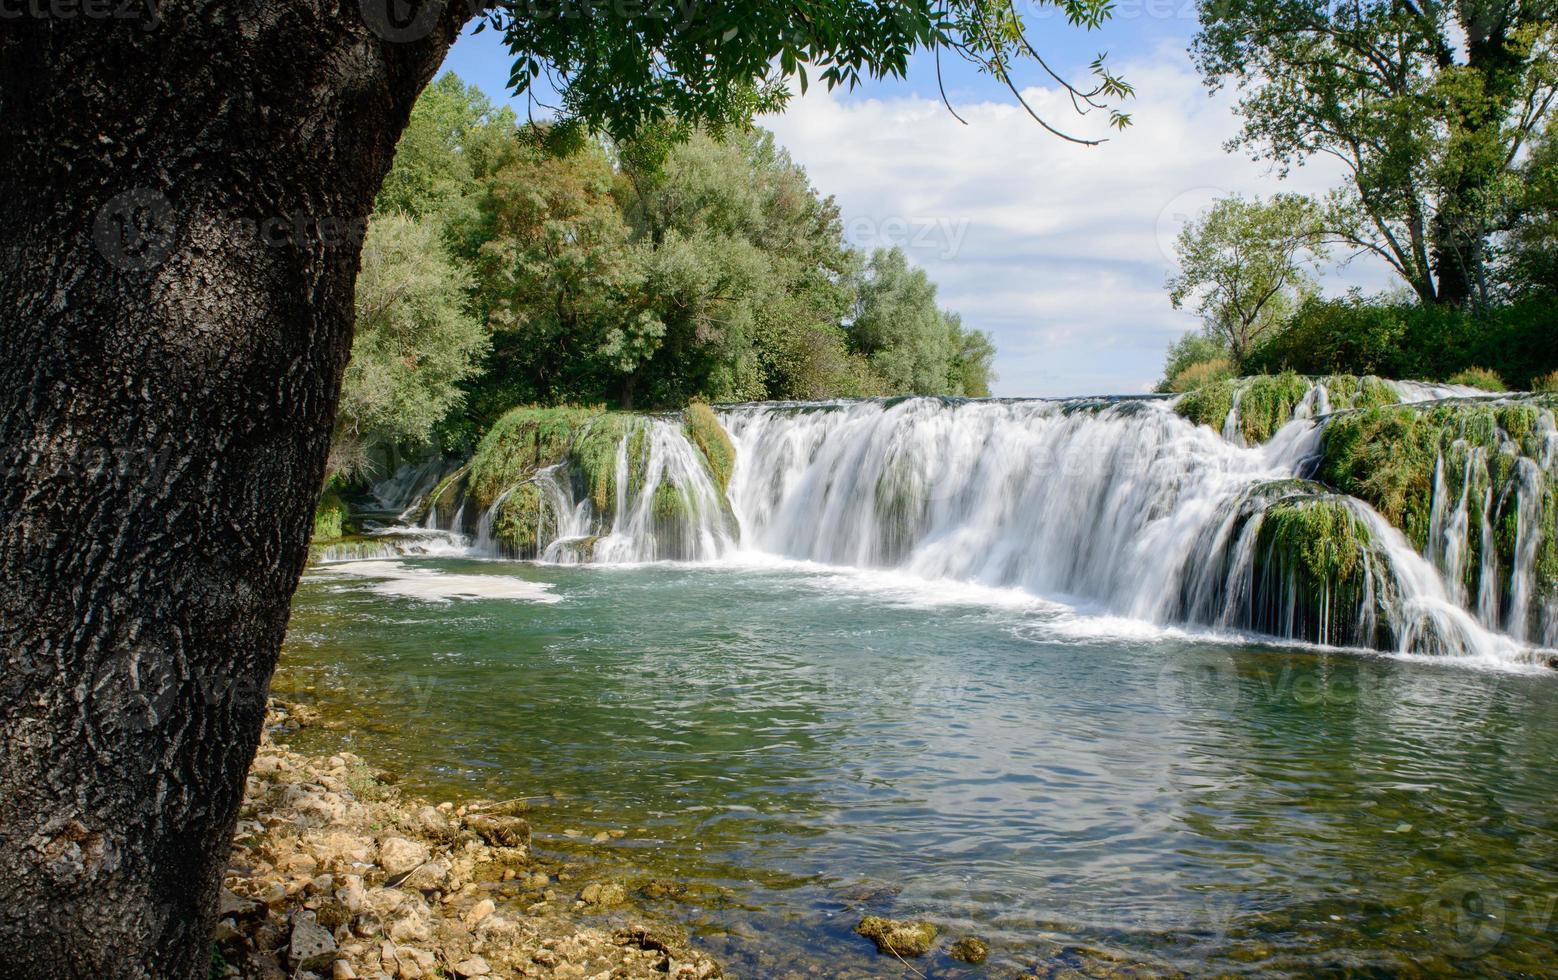 prachtige waterval waterval foto